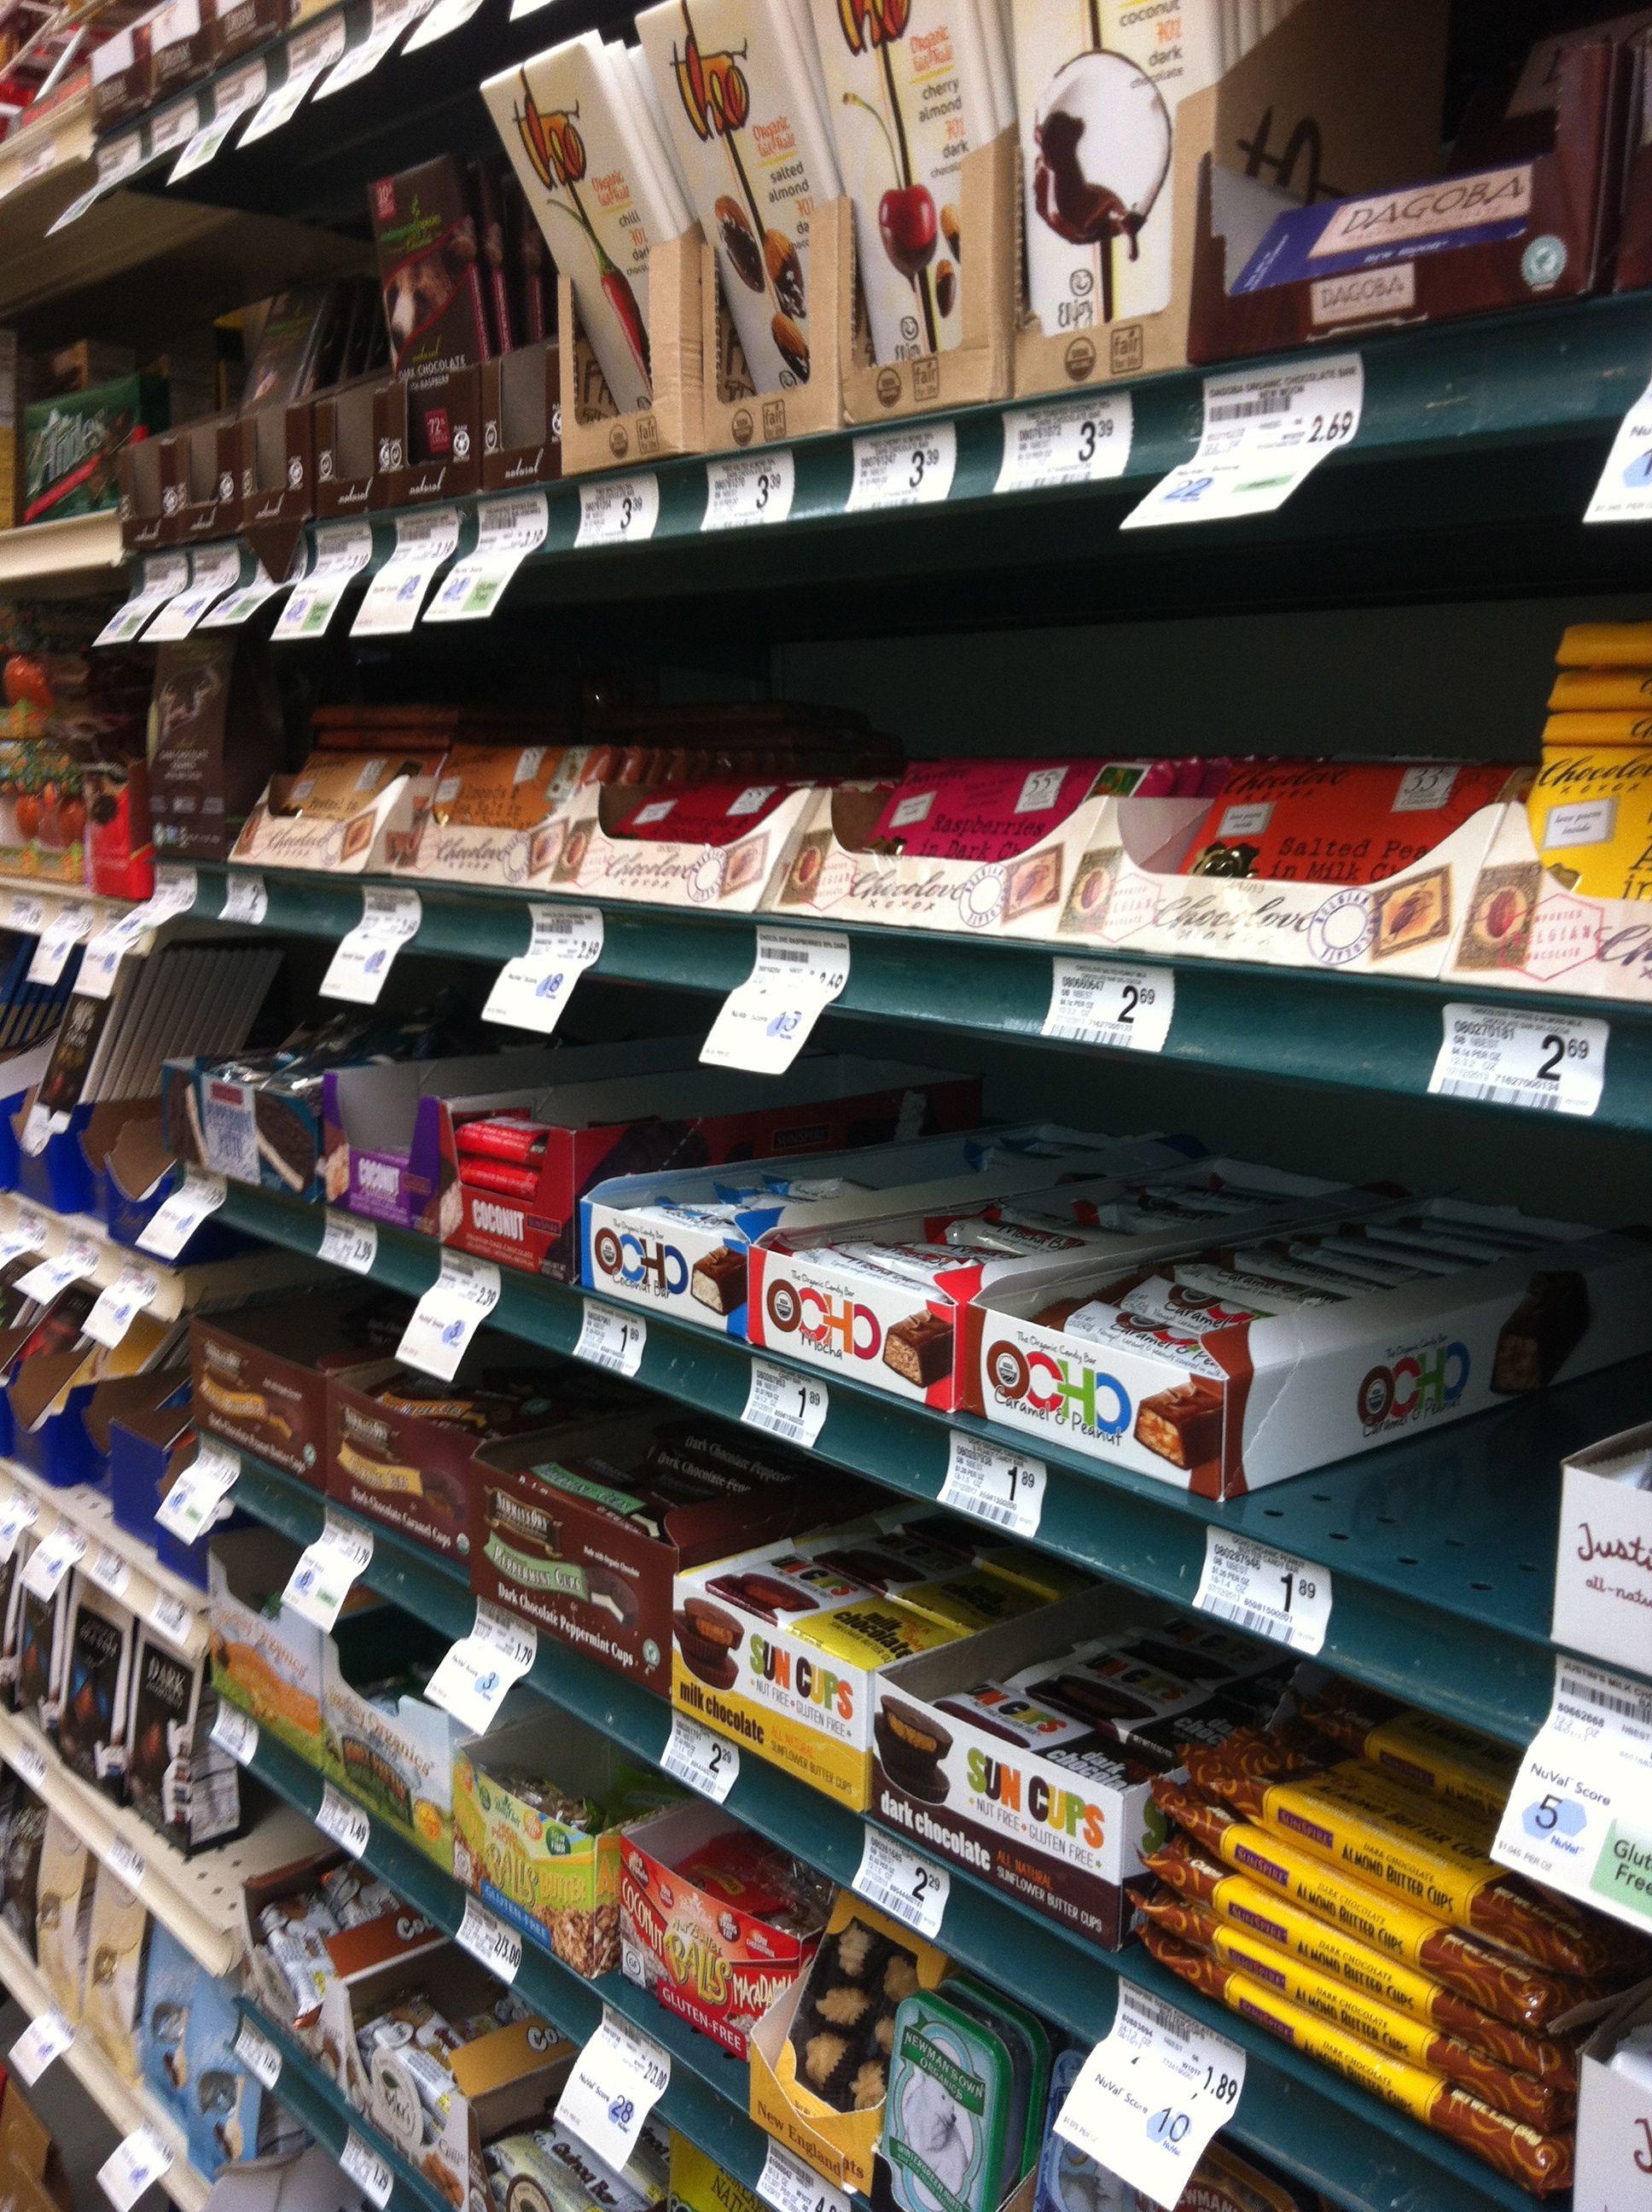 Rocklin Bel Air Shelf Placement, Natural Foods Section